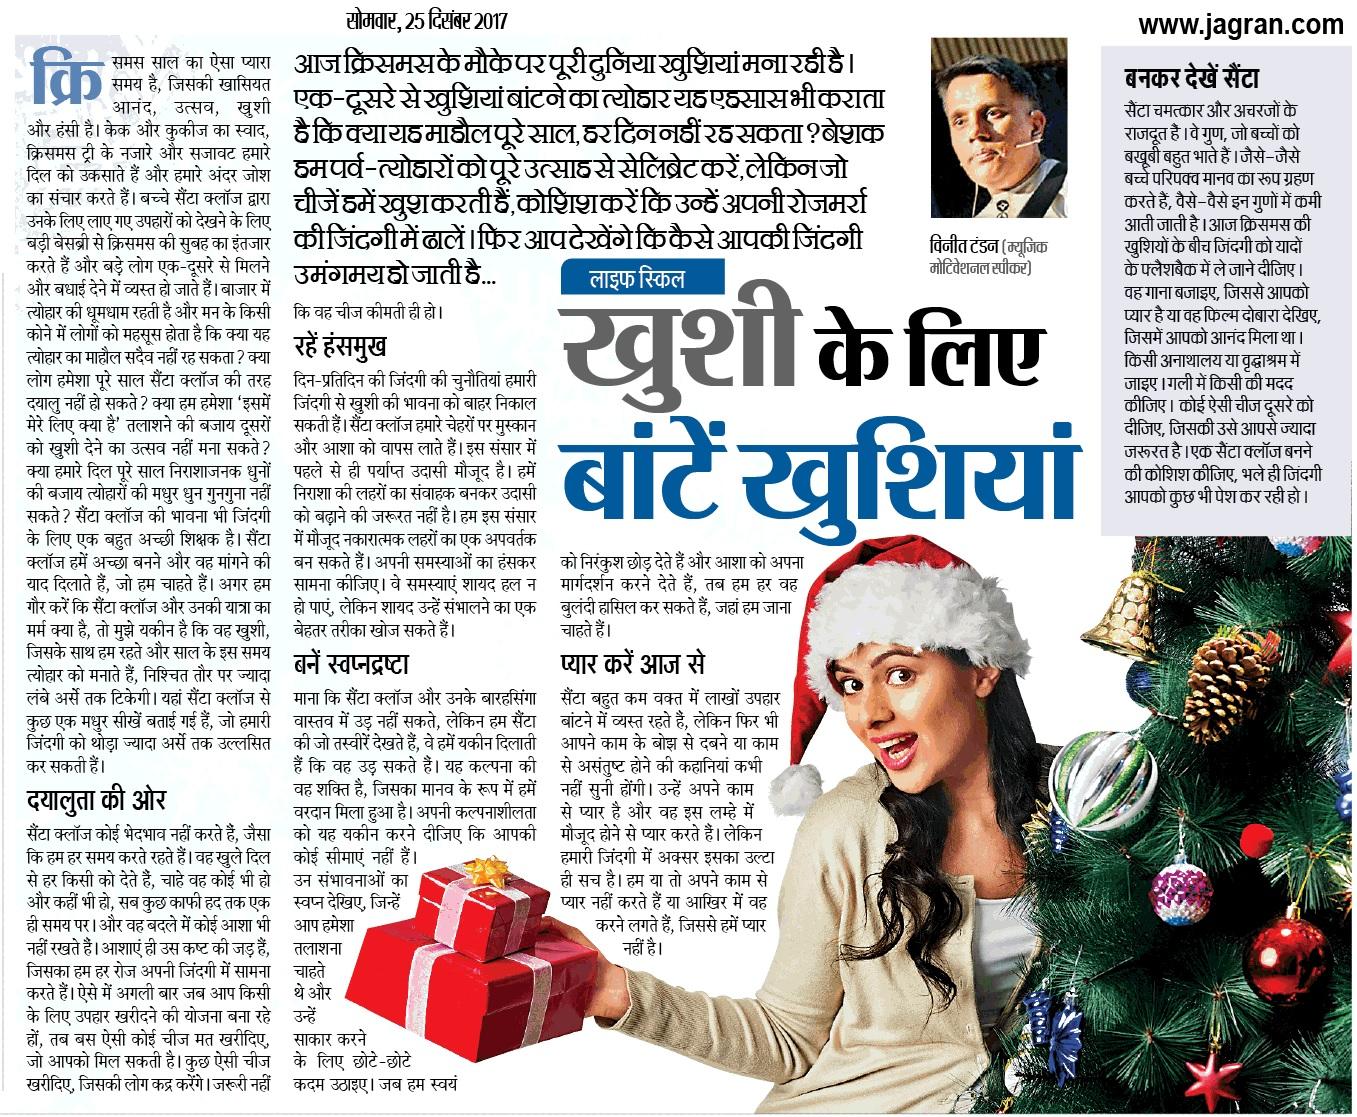 Dainik Jagran 25 Dec 2017